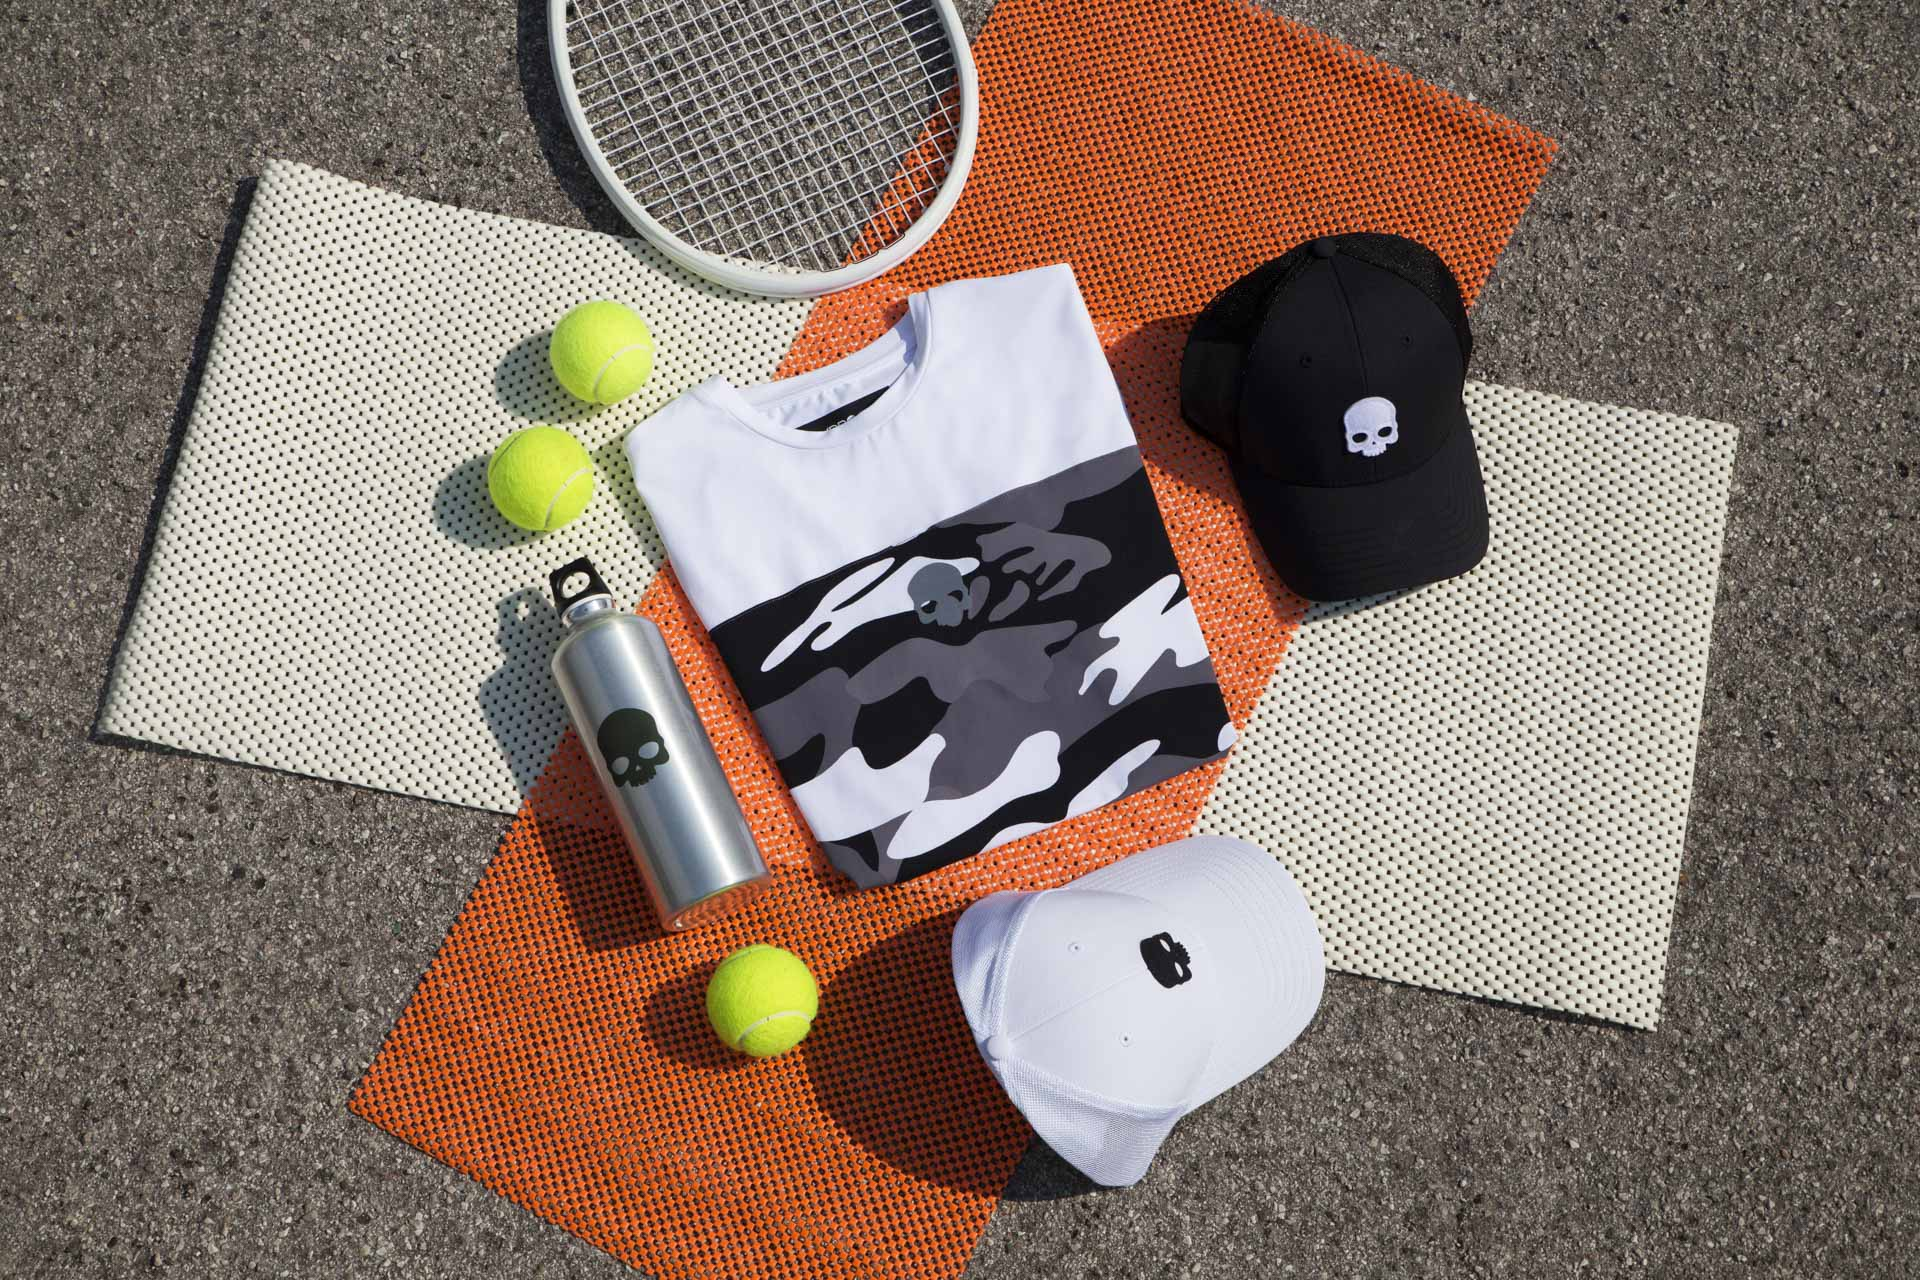 Hydrogen_flatlay_tennis_francescabandiera